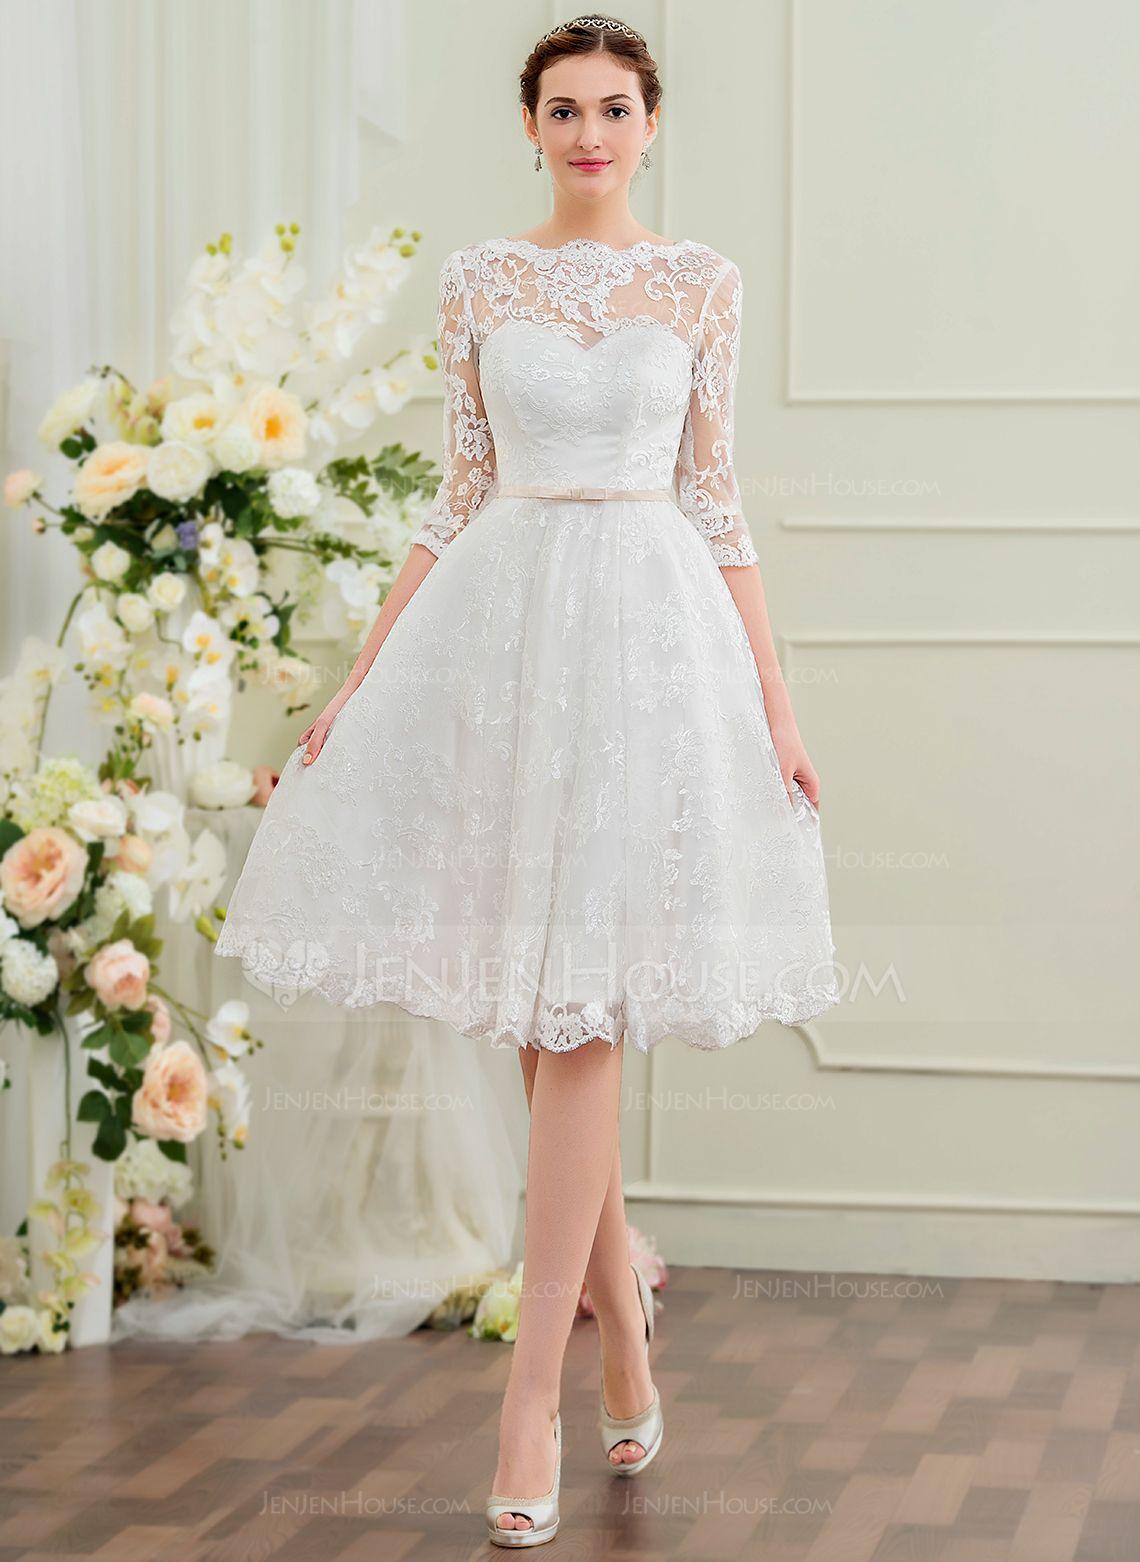 d898536e5fa A-Line Princess Scoop Neck Knee-Length Lace Wedding Dress With Bow(s)  (002095845) - JenJenHouse